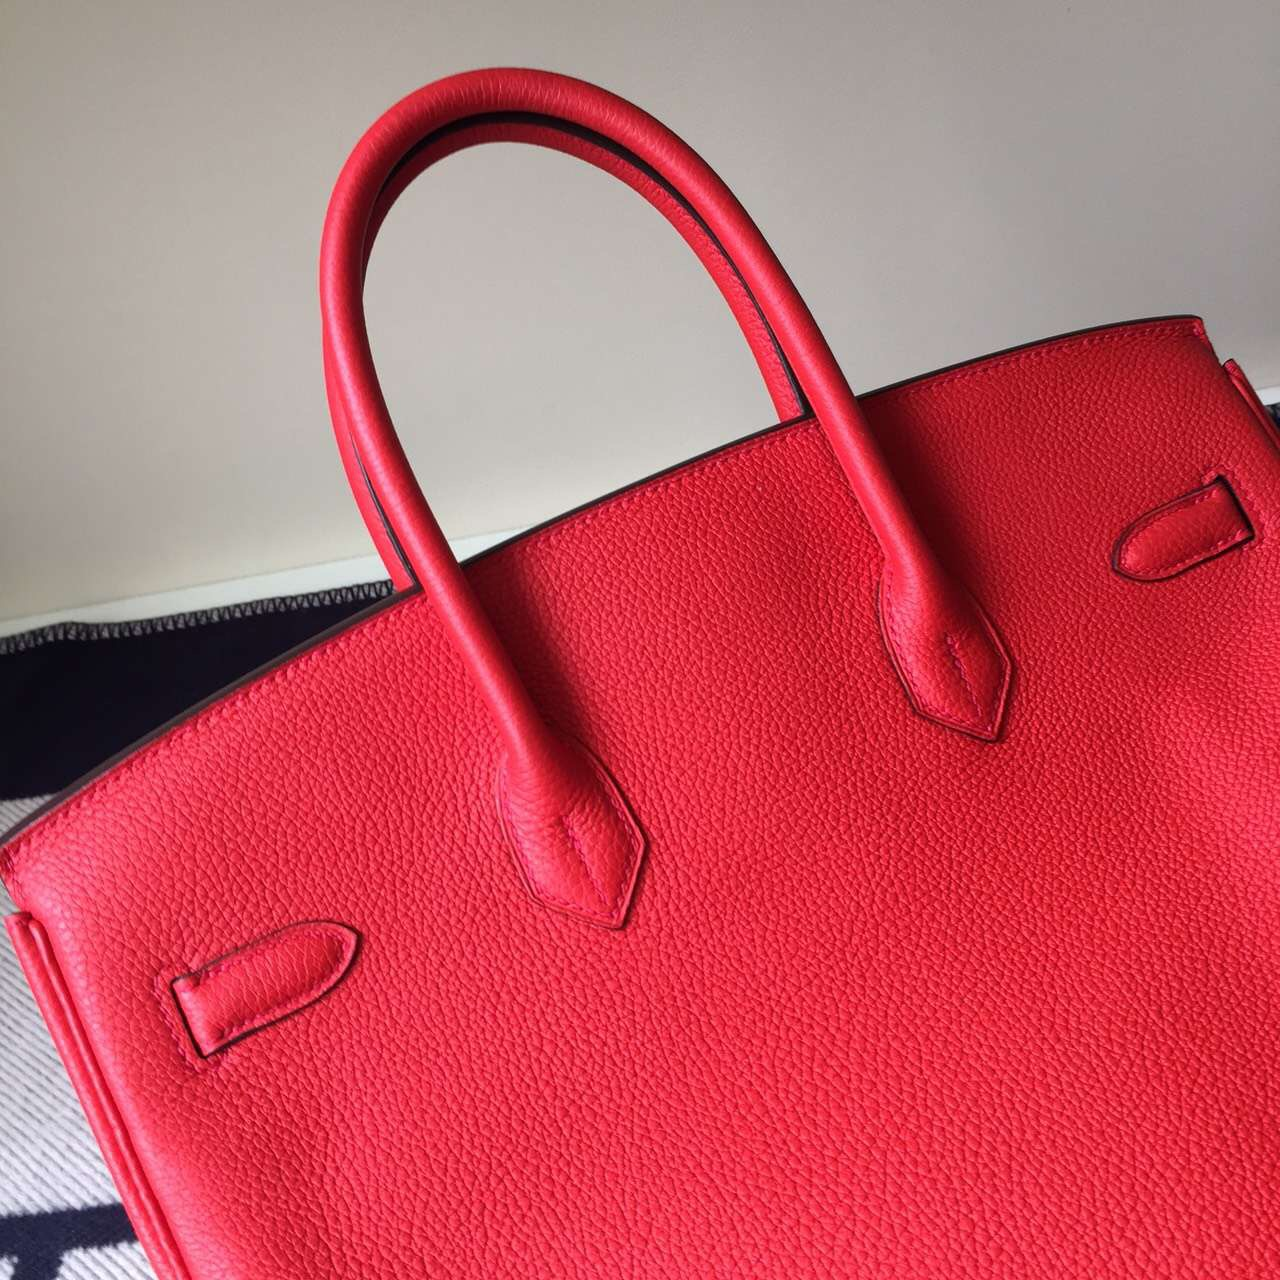 Hand Stitching Hermes Togo Calfskin Leather Birkin Bag 35cm in A5 Azalea Red